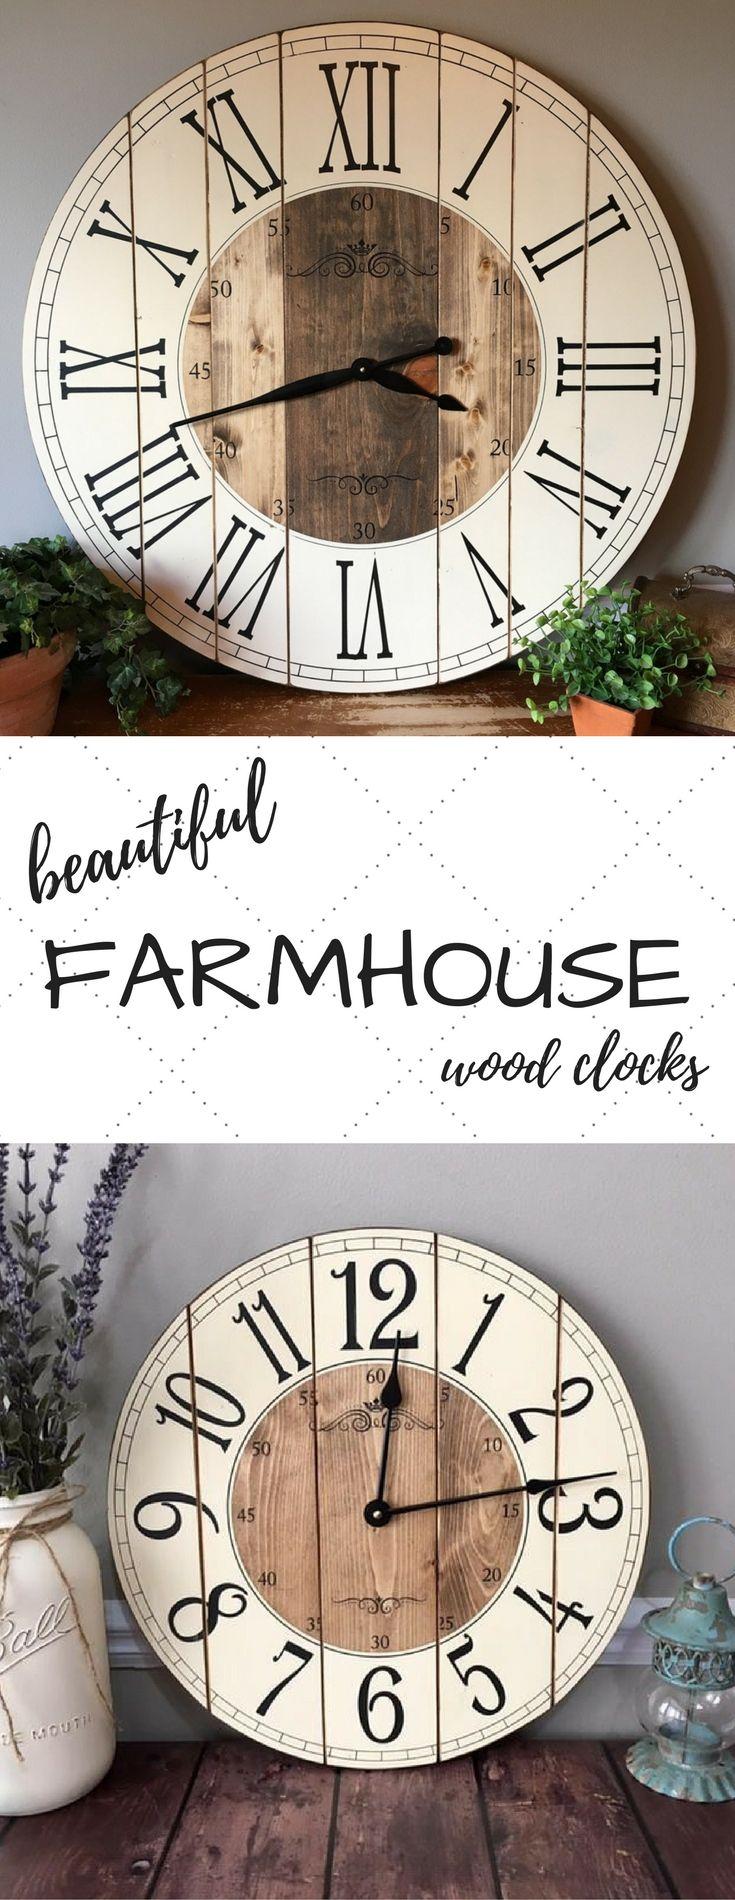 Am americana country wall clocks - 16 Inch Farmhouse Clock Rustic Wall Clock Small Wall Clock Unique Wall Clock Personalized Clock Distressed Clock Wooden Clock